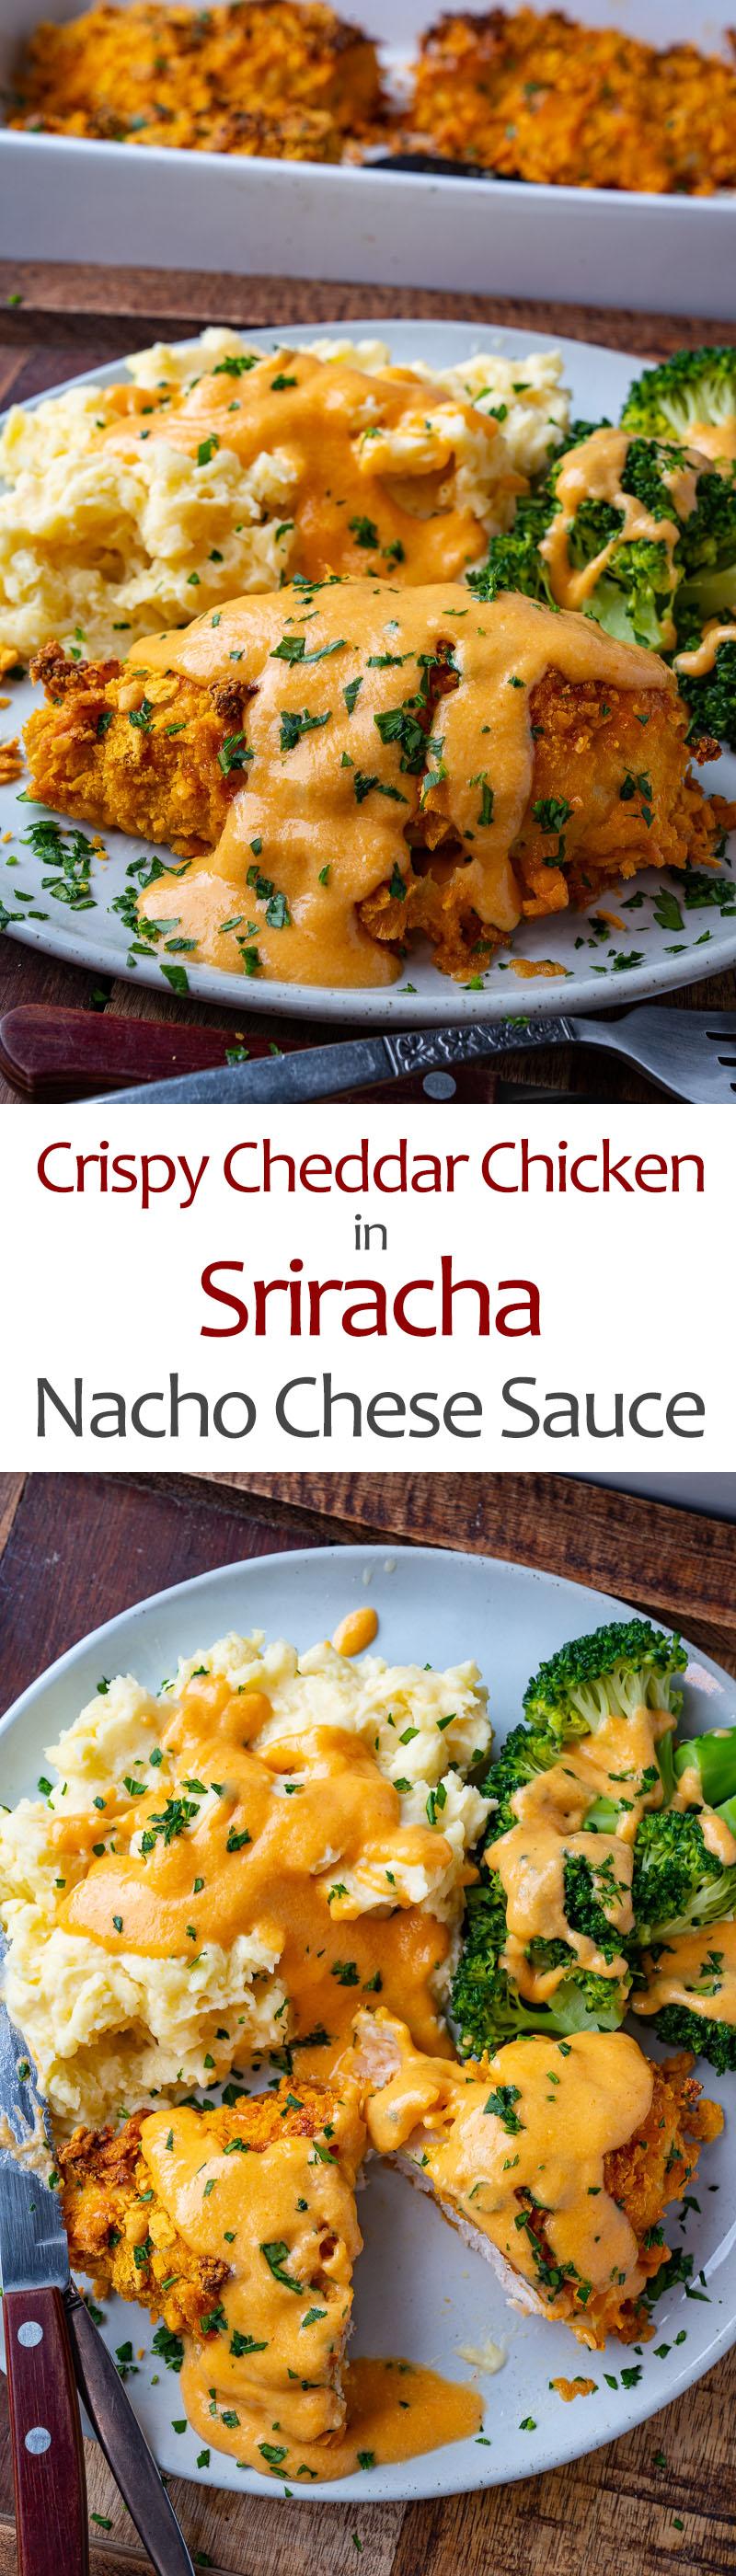 Crispy Cheddar Chicken in Sriracha Nacho Cheese Sauce